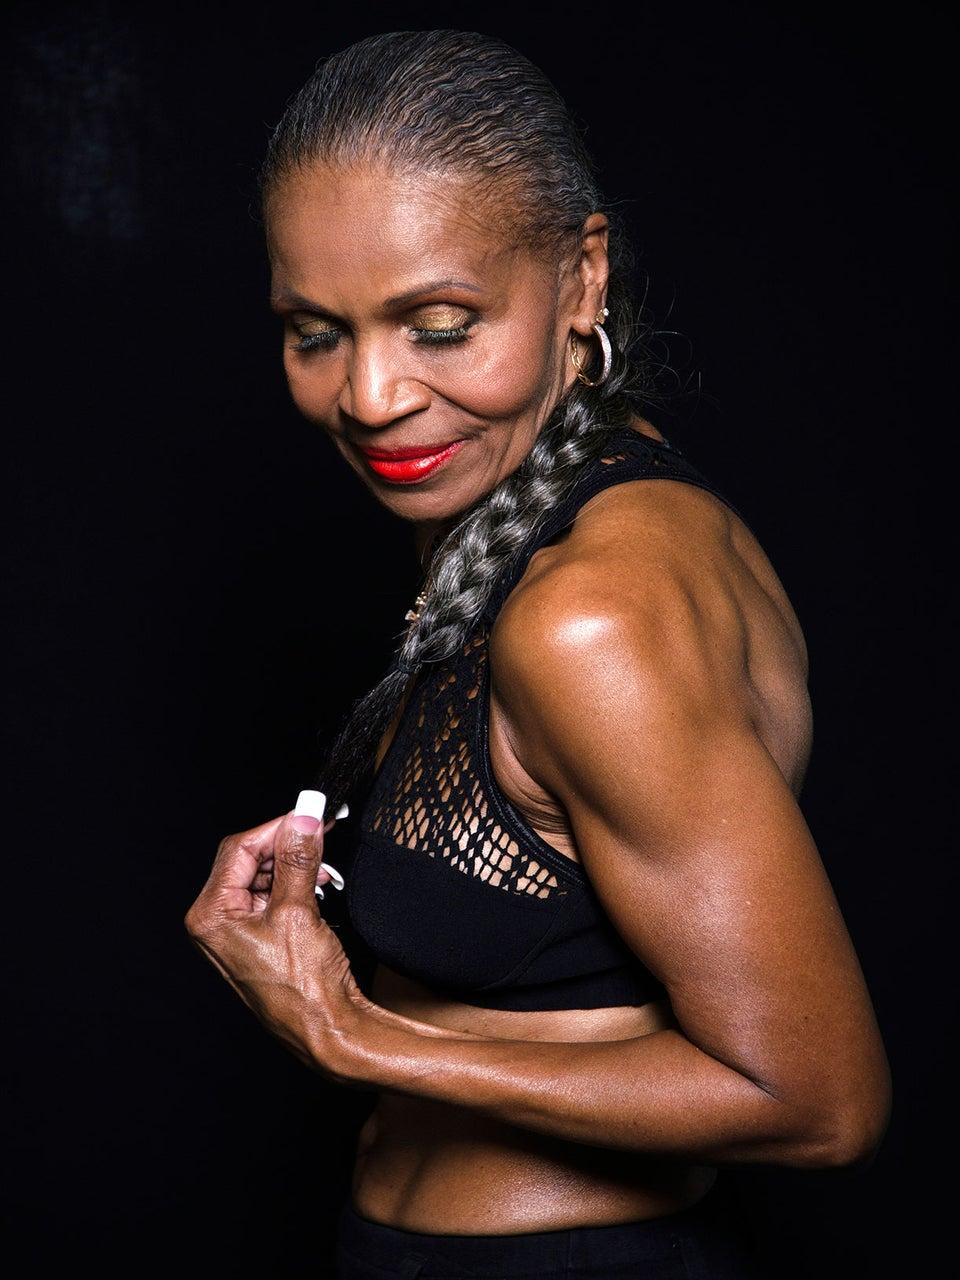 #BlackGirlMagic Goals! Body Builder Ernestine Shepherd Celebrates Her 80th Birthday